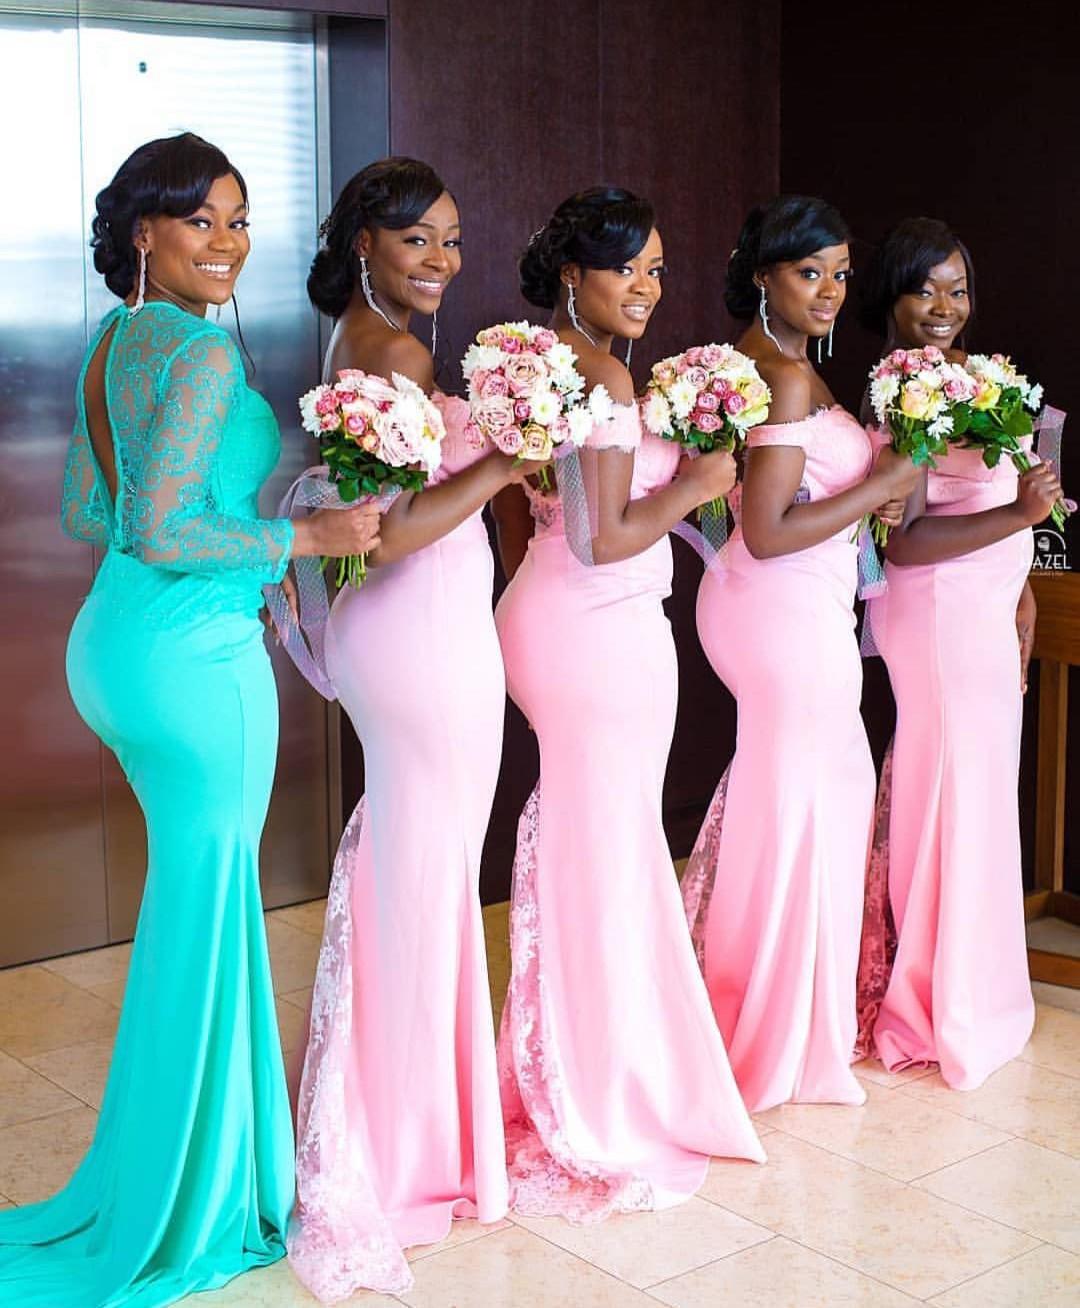 ELEGANT NIGERIAN 2020 WEDDING STYLES TO AMAZE YOUR GUESTS 4